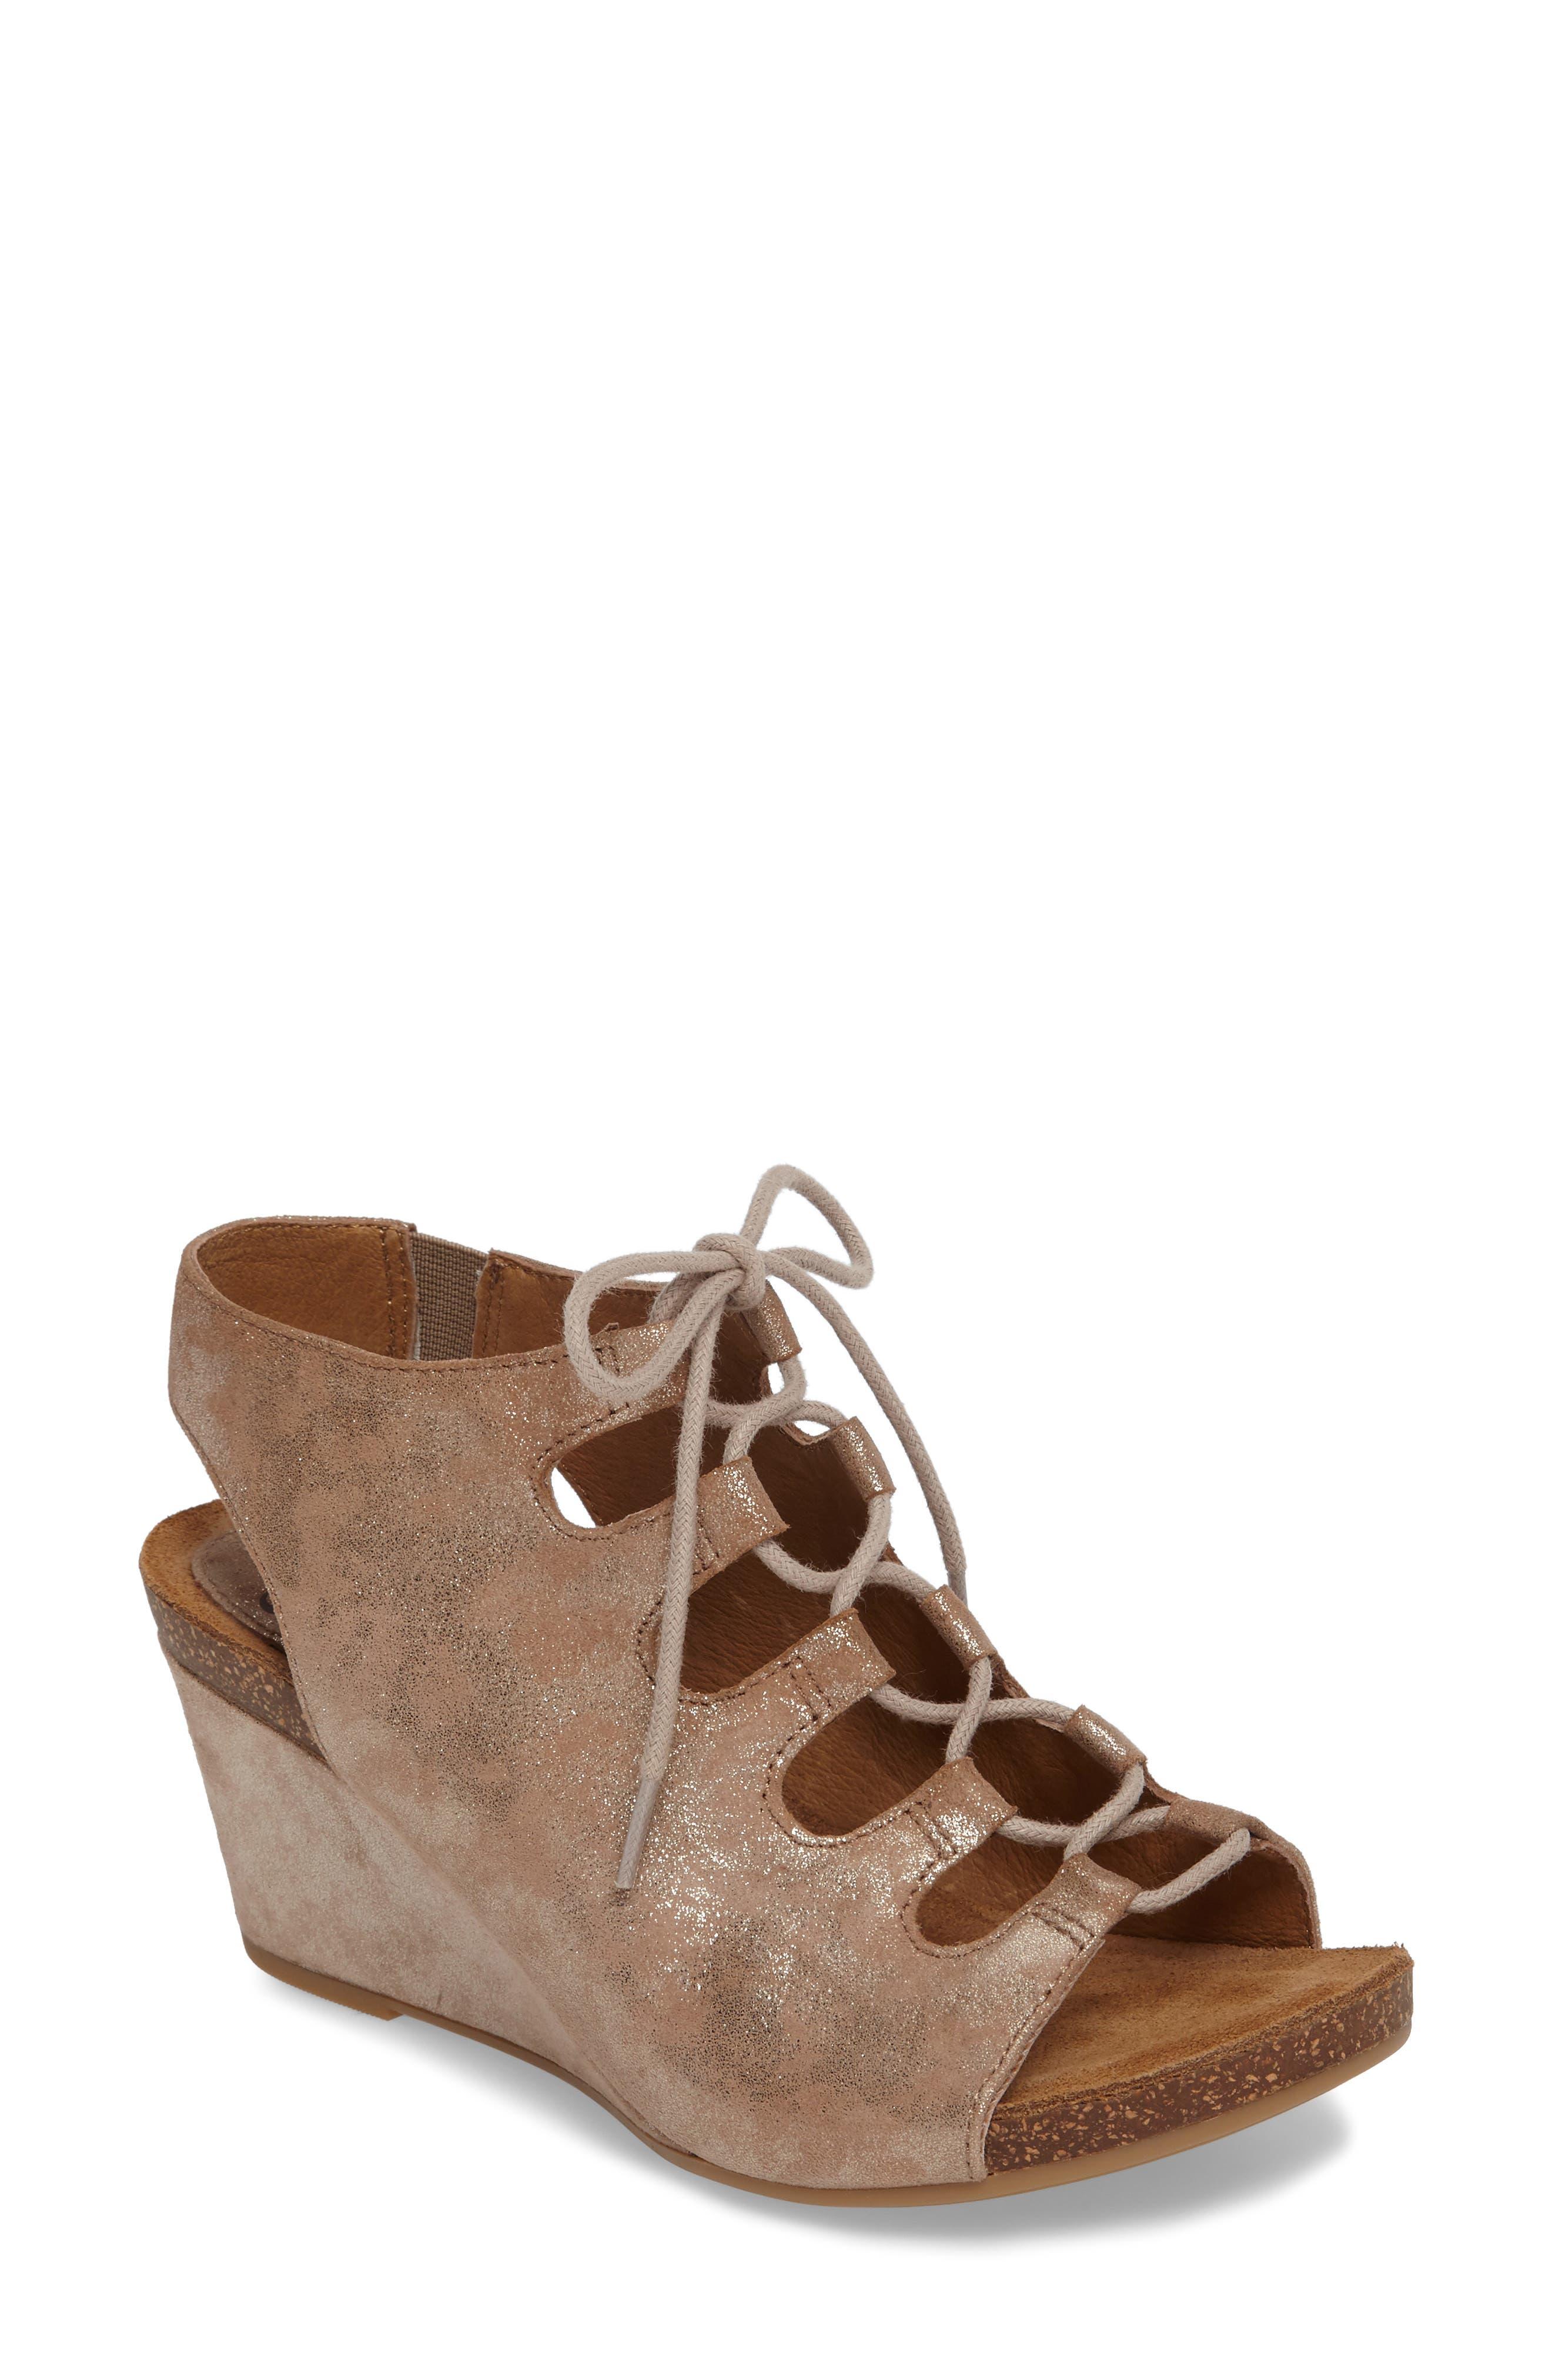 Söfft Maize Wedge Sandal (Women)